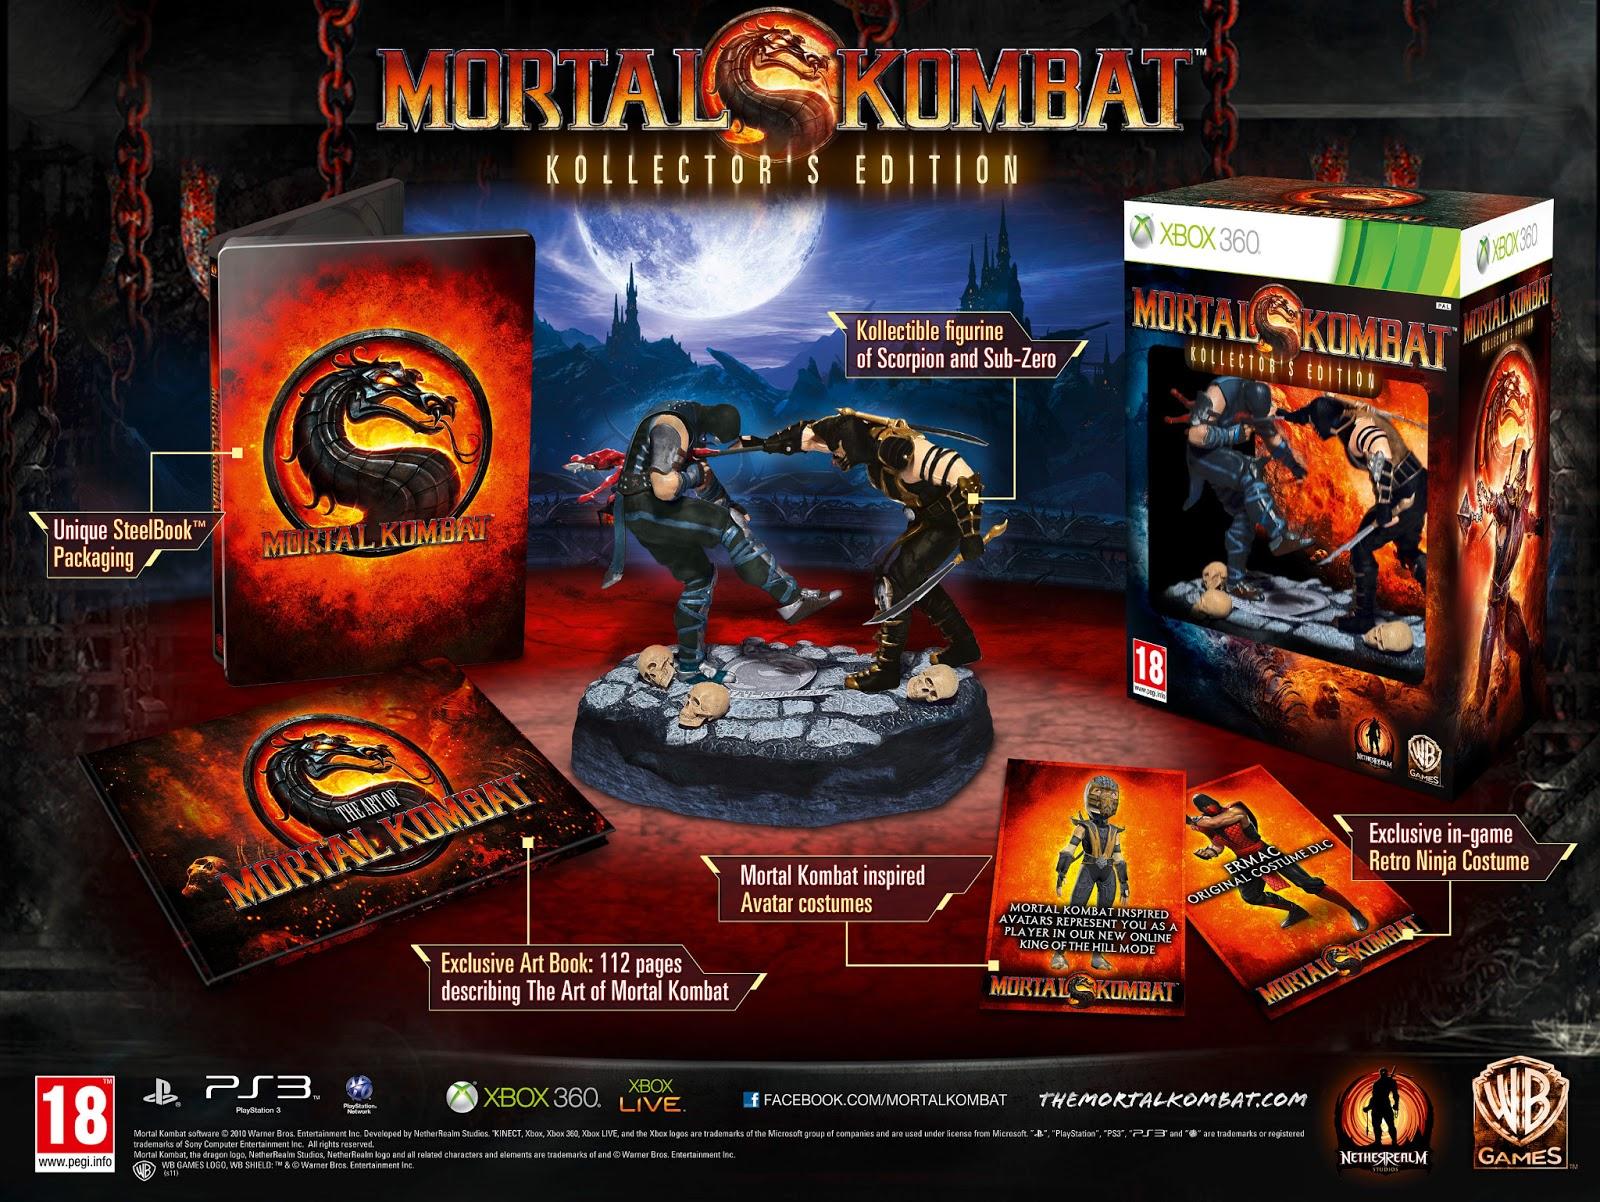 Free Download Mortal Kombat 9 Full Version For PC - photo#35